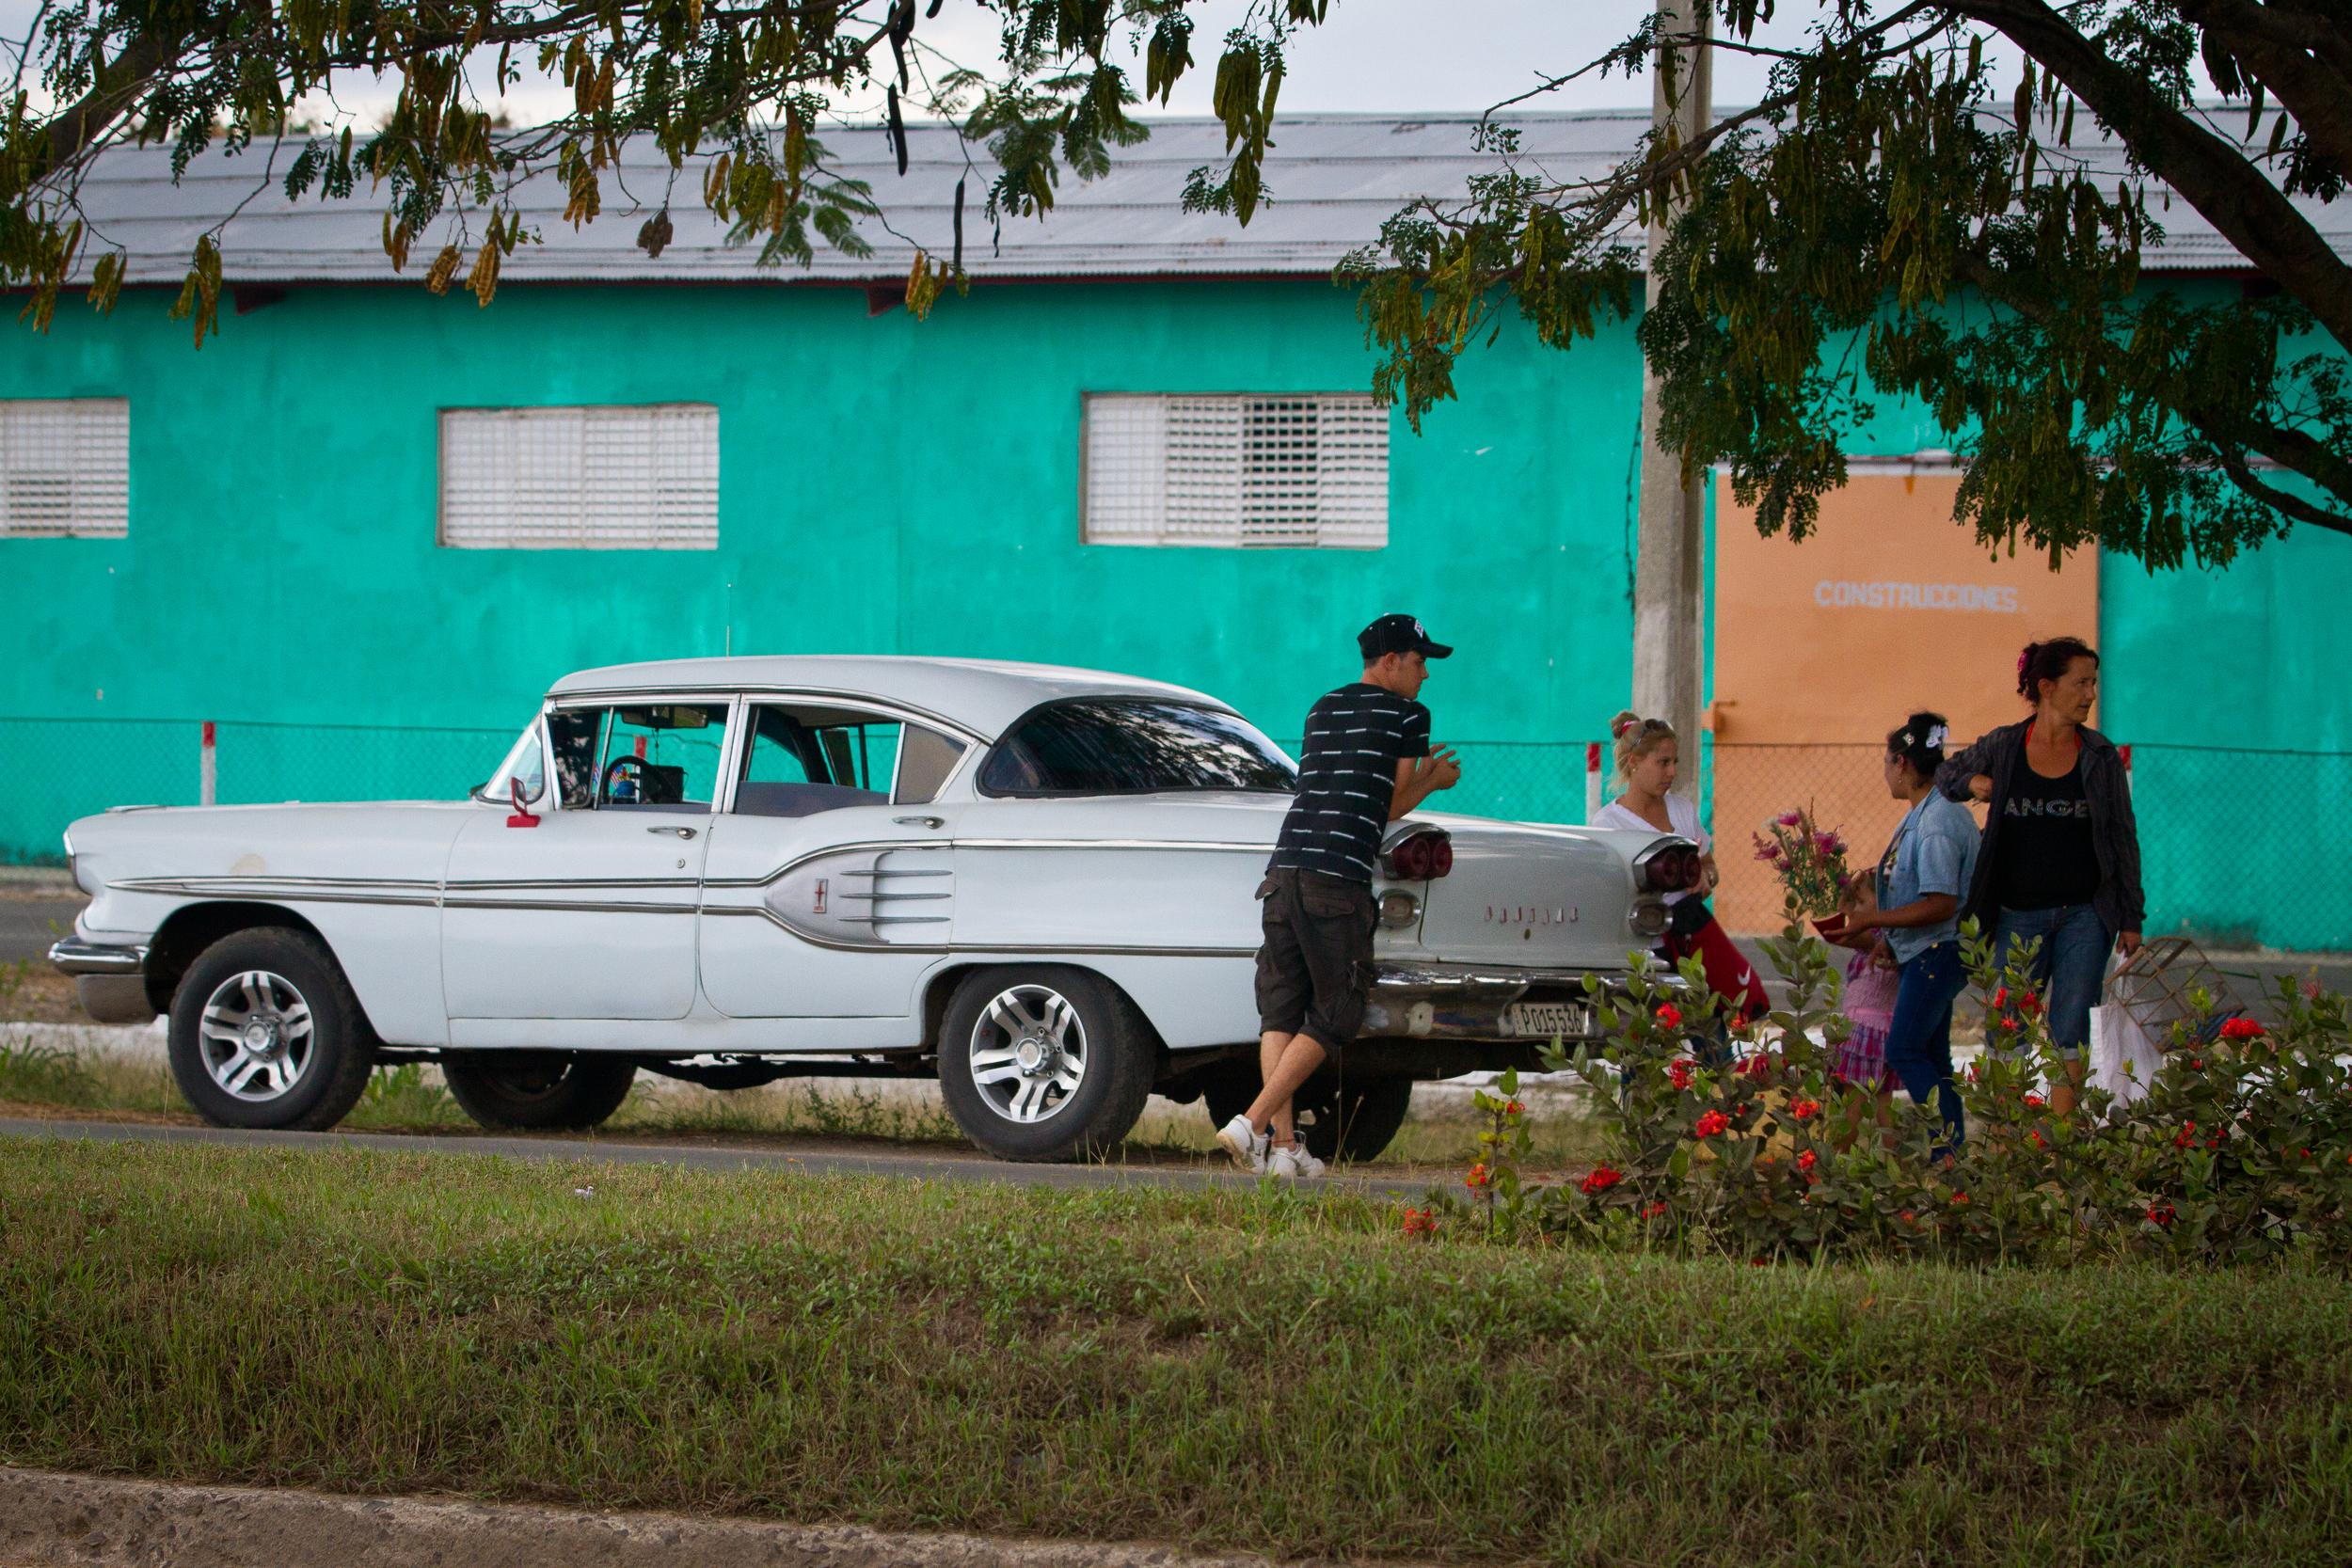 Locals hanging out by their classic American chrome, Ciego de Avila, Cuba